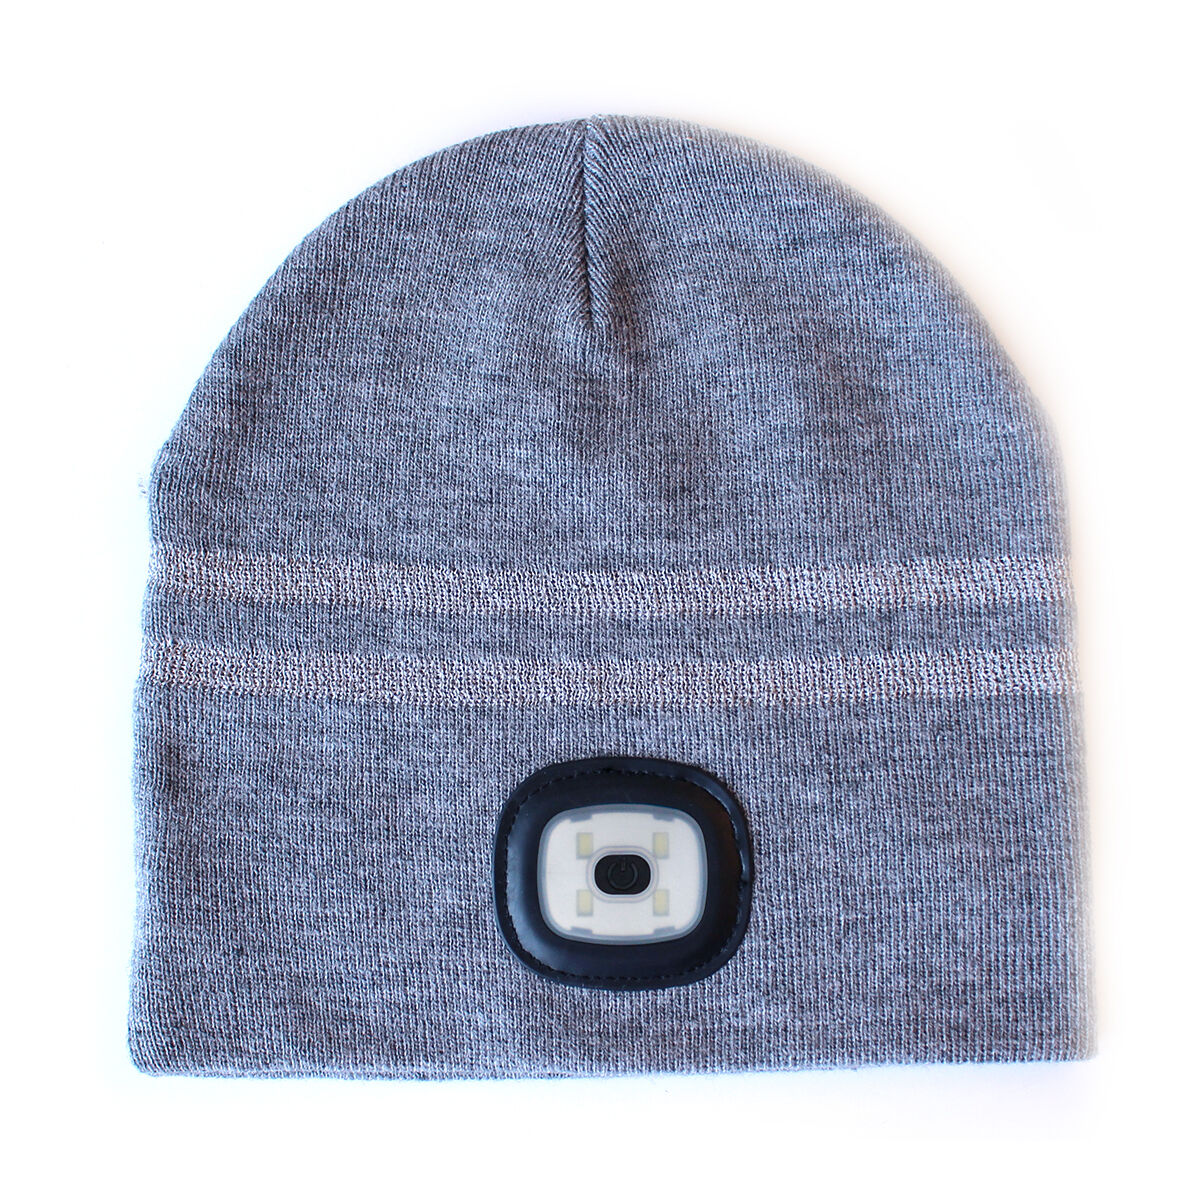 2 x Warm USB Headlight Hat X-Cap Integrated LED Grey Camping Walking Running